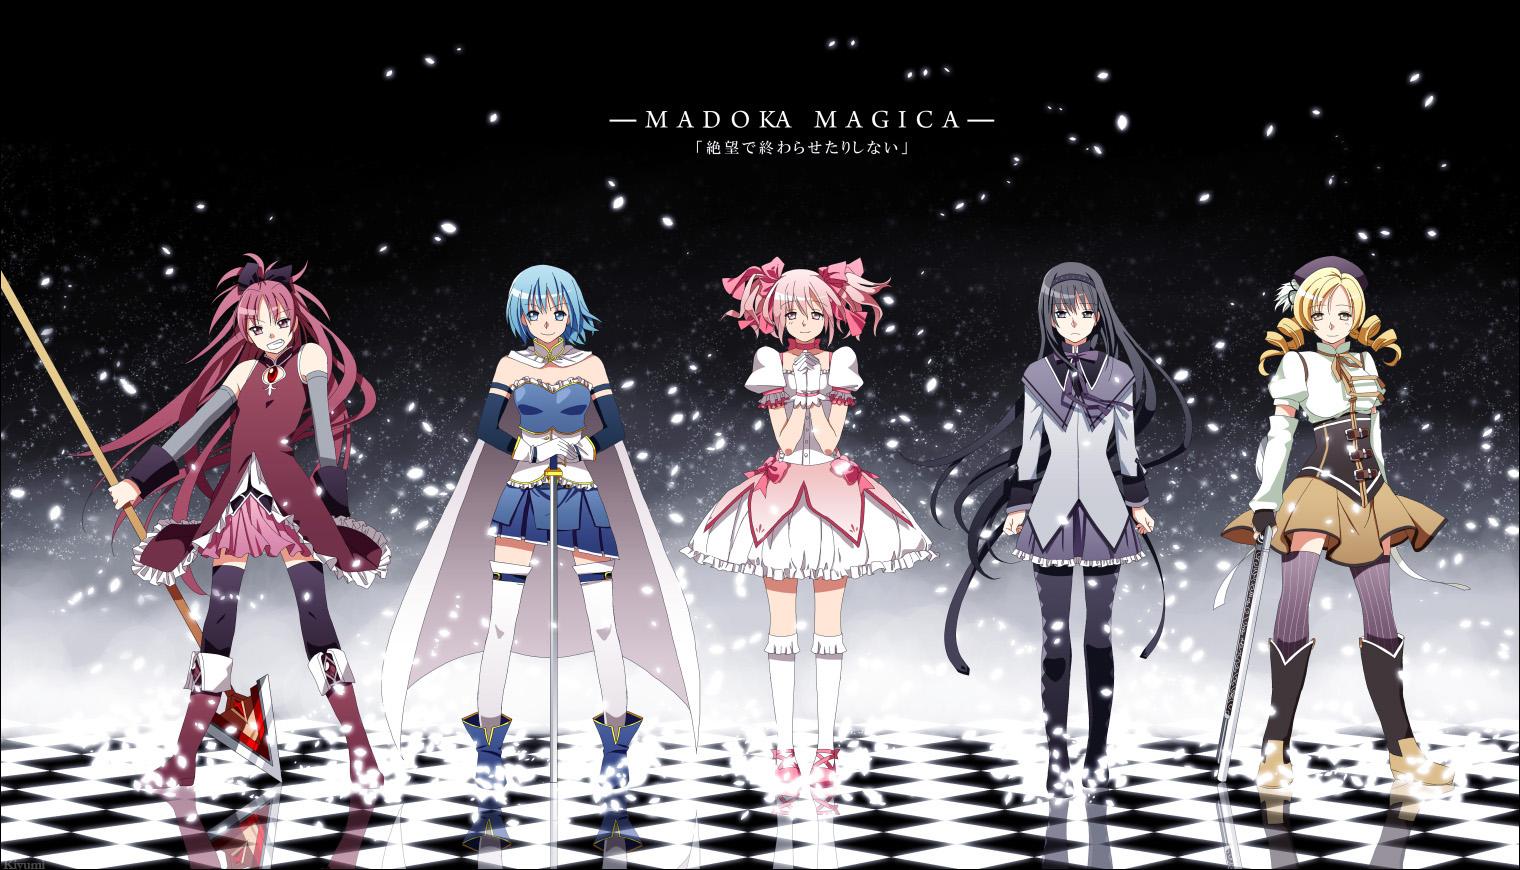 Download Pack Mahou Shoujo MadokaMagica Episode 1 12 Complete English Subbed